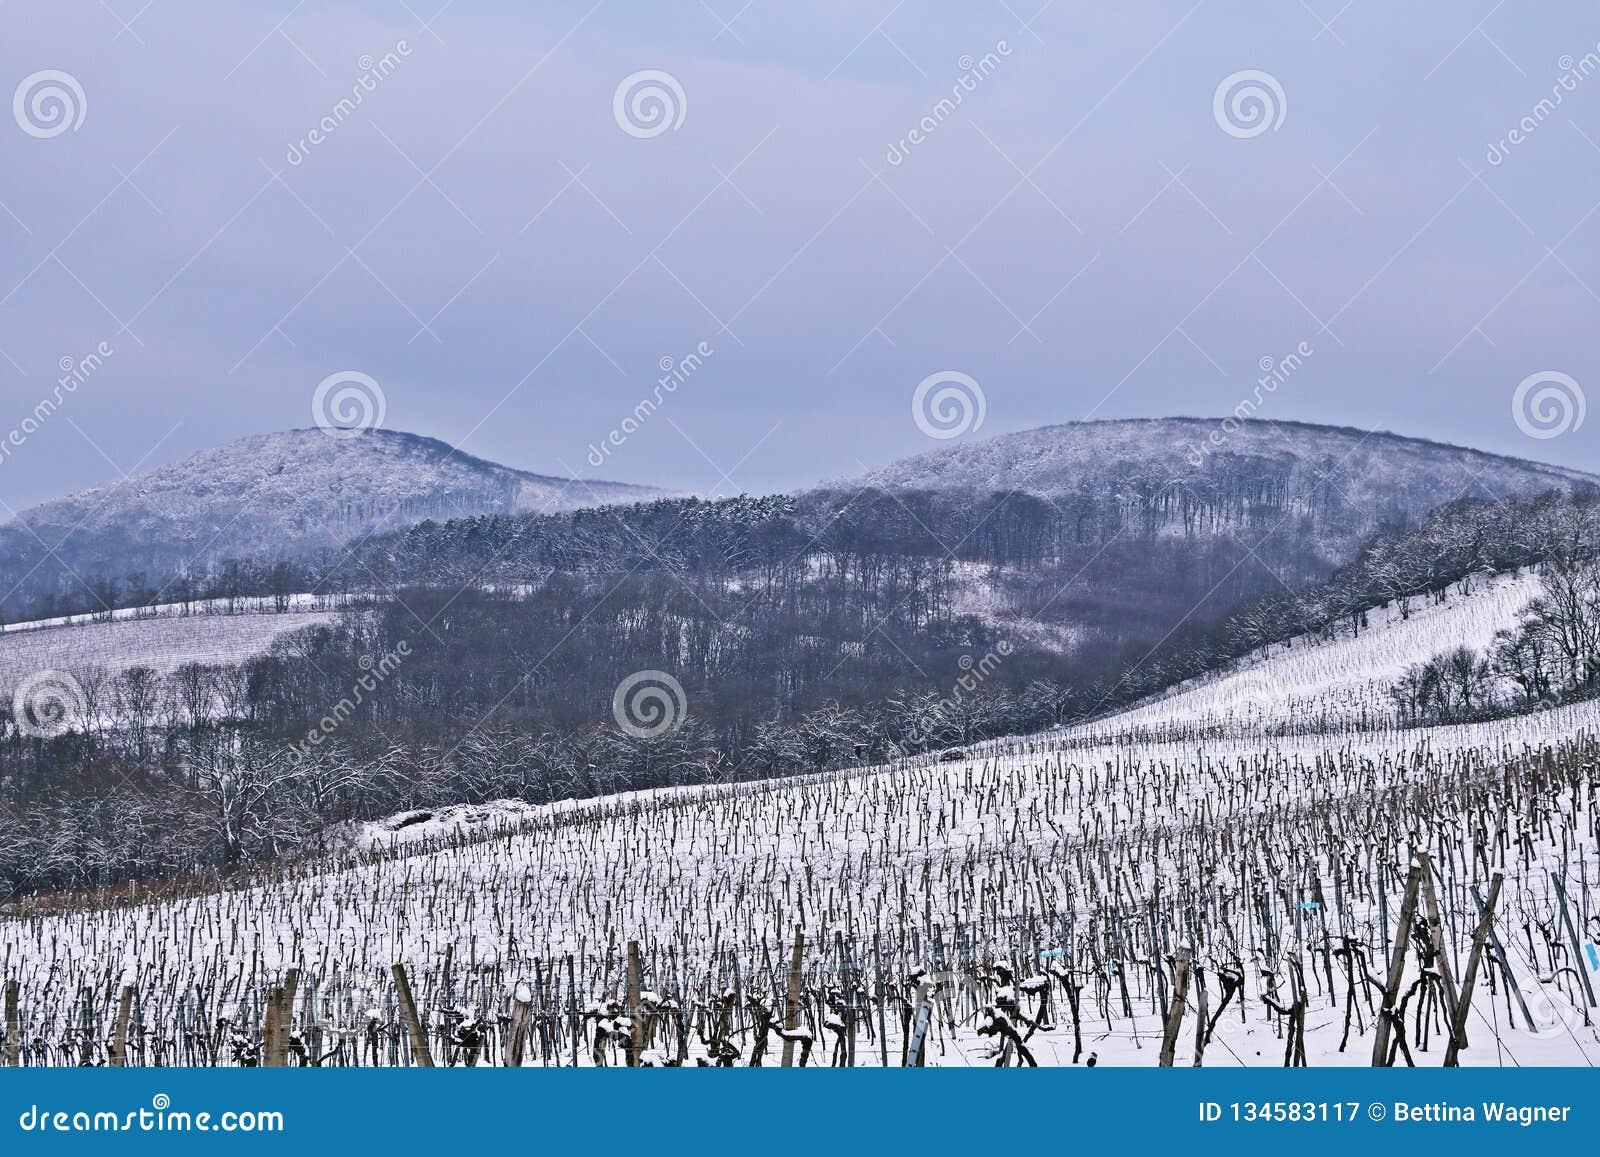 Vienna Vineyards In Winter Stock Image Image Of Romantic 134583117